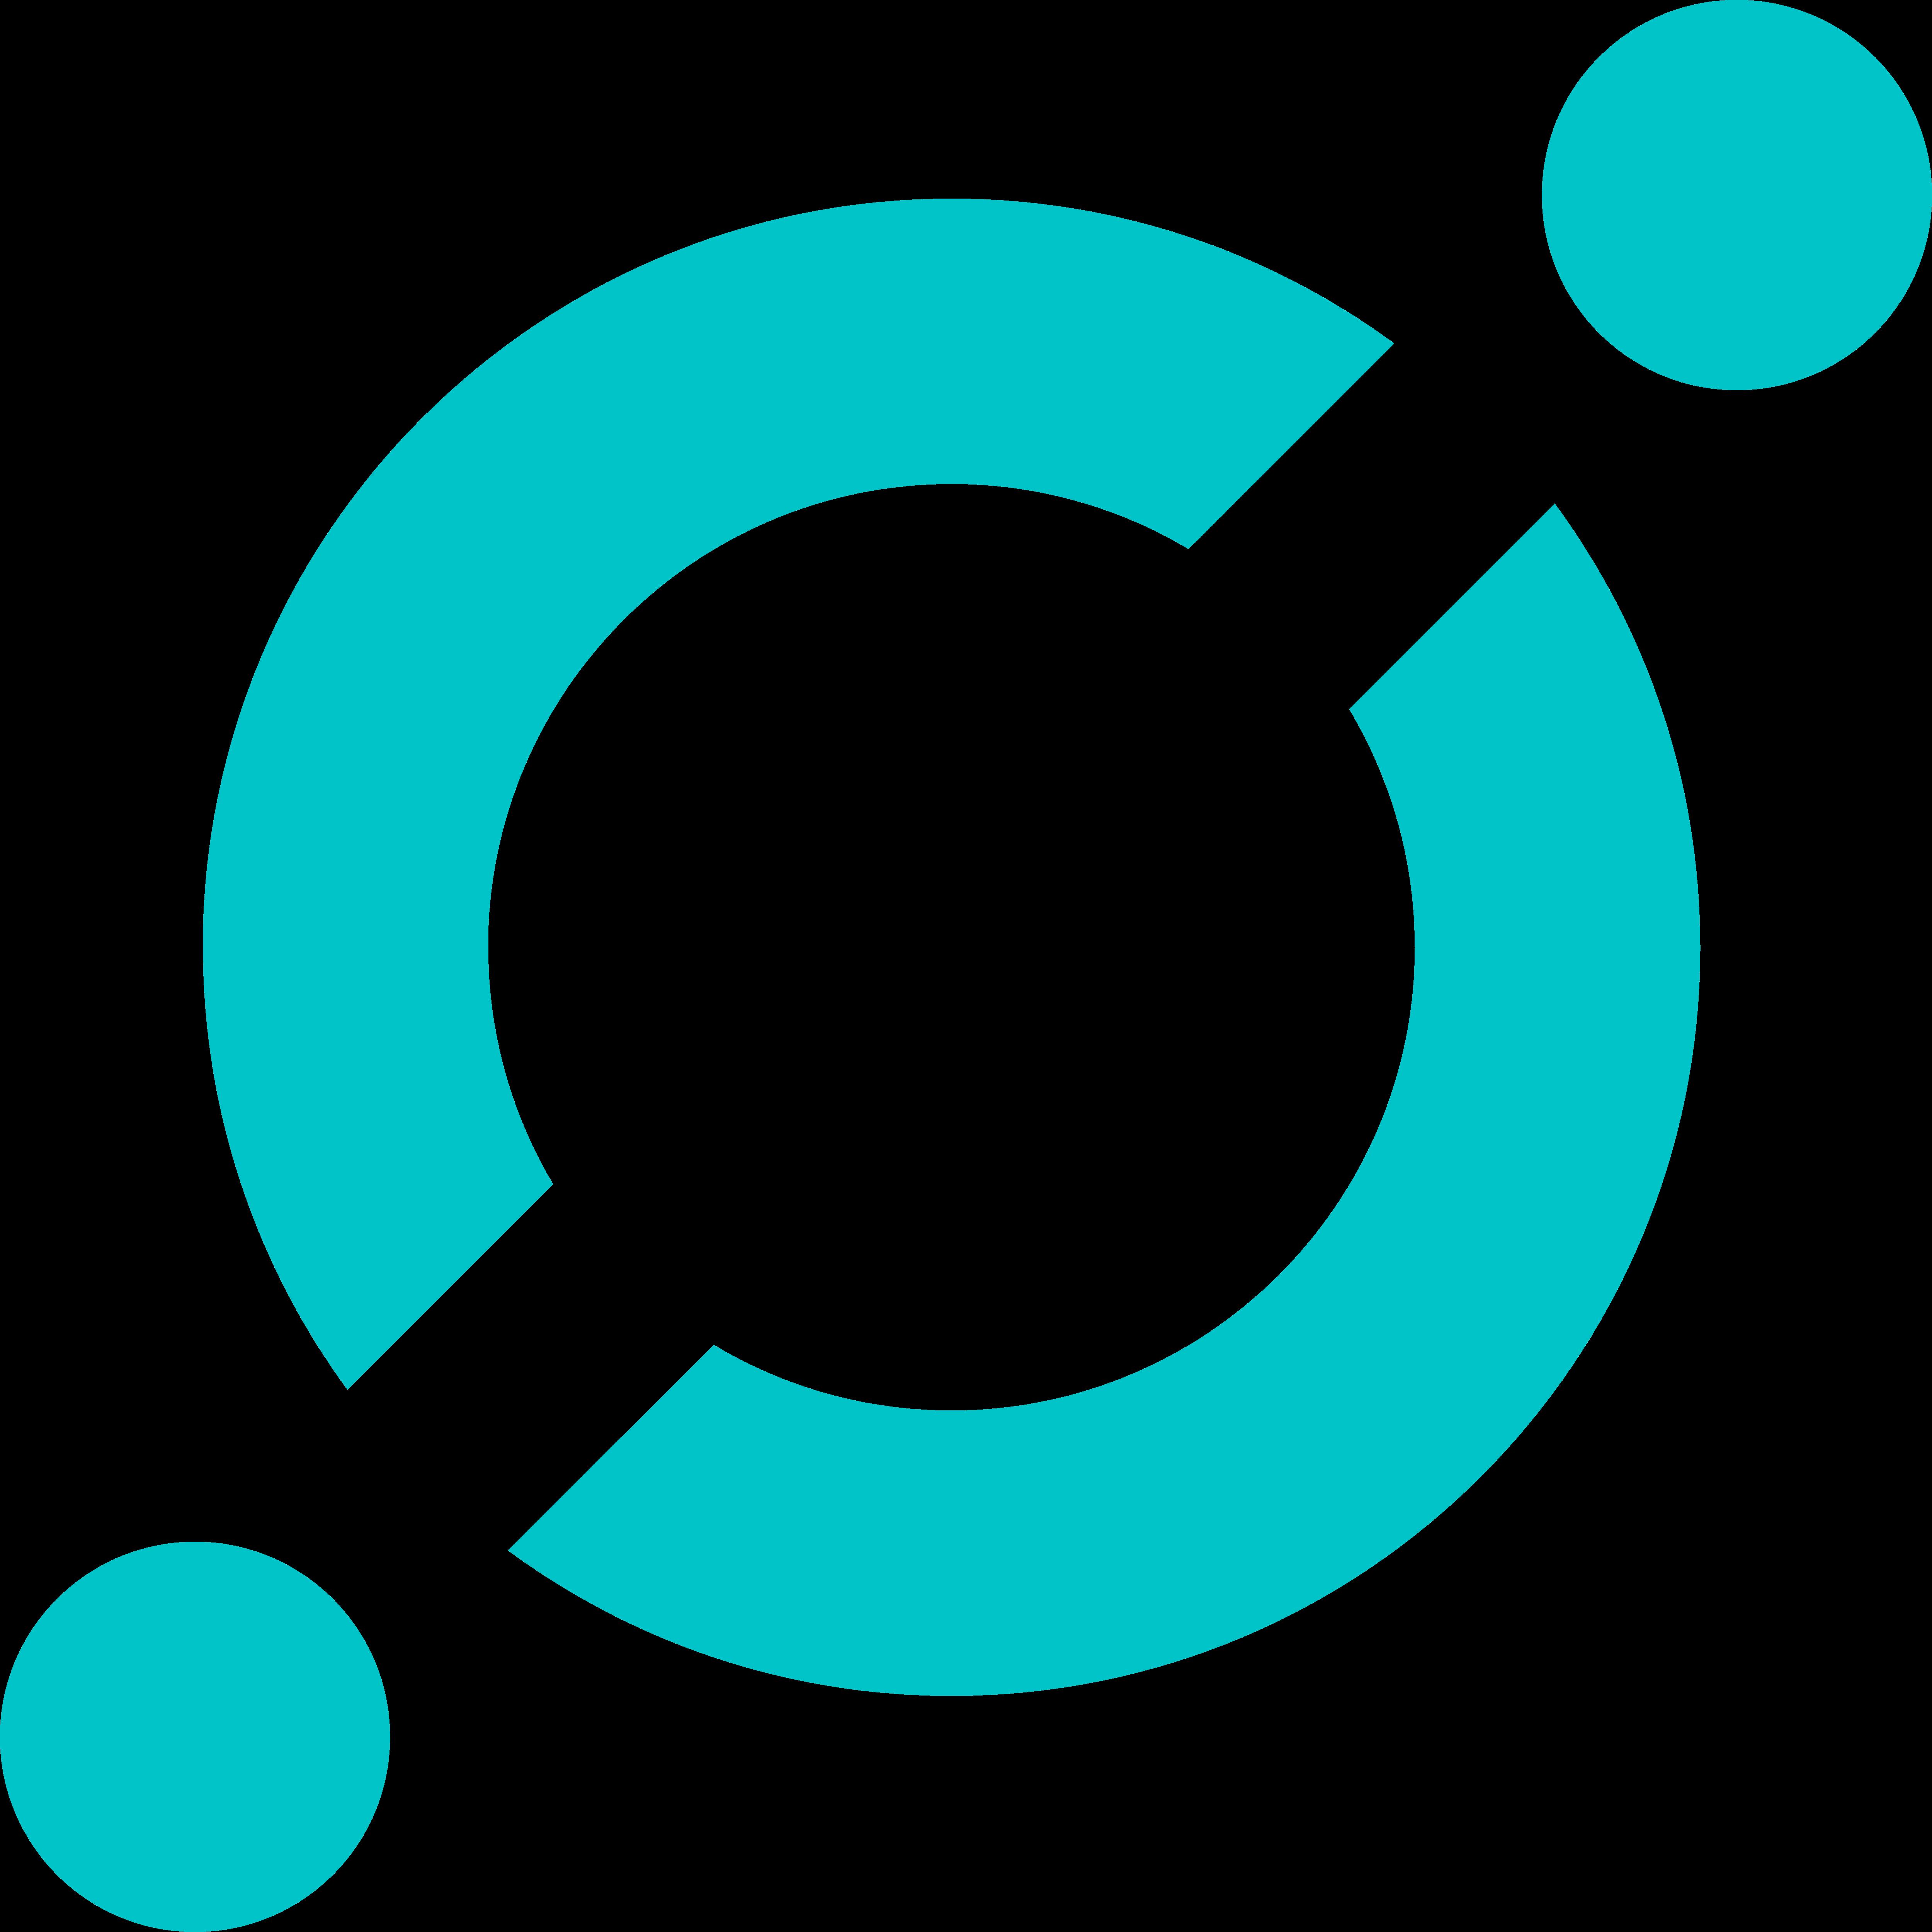 Icon Logos Download